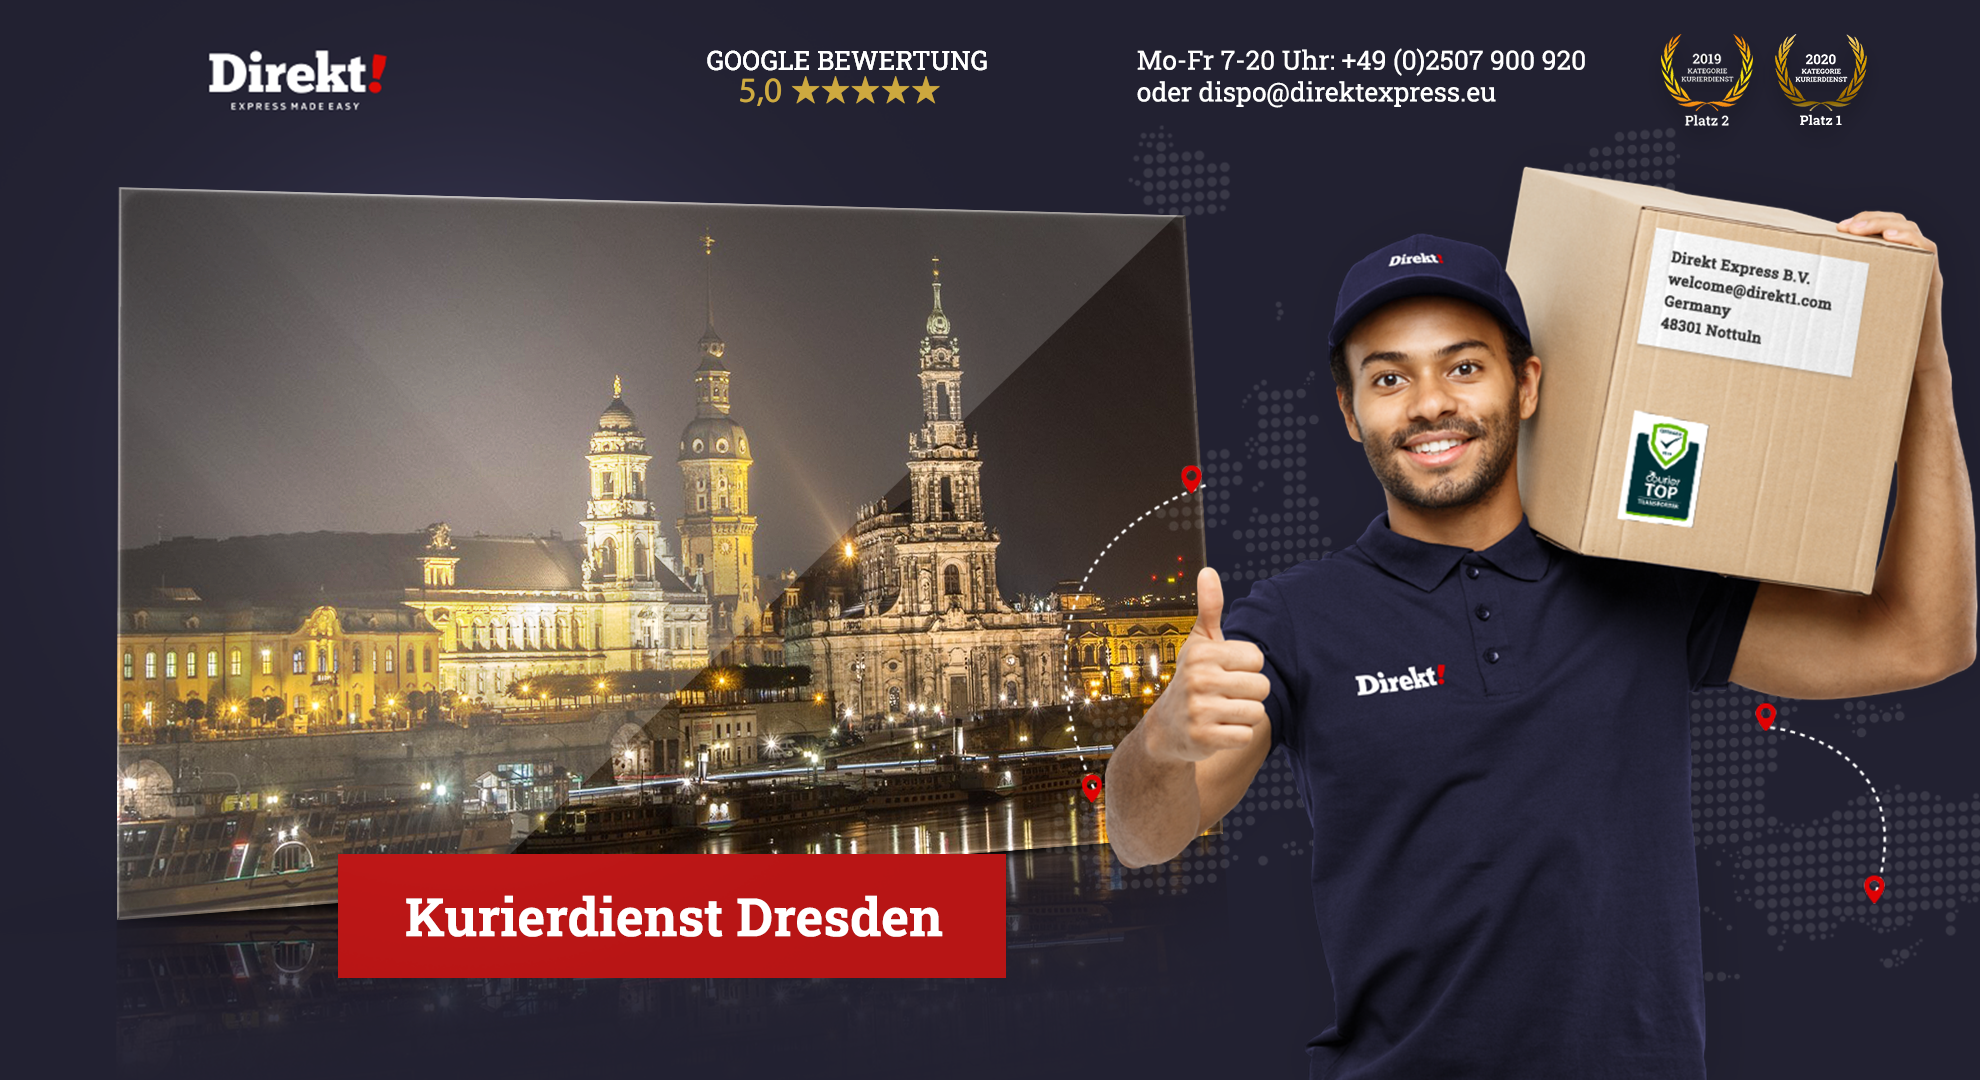 https://direkt1.com/wp-content/uploads/2021/06/Kurierdienst-dresden-buchen.png